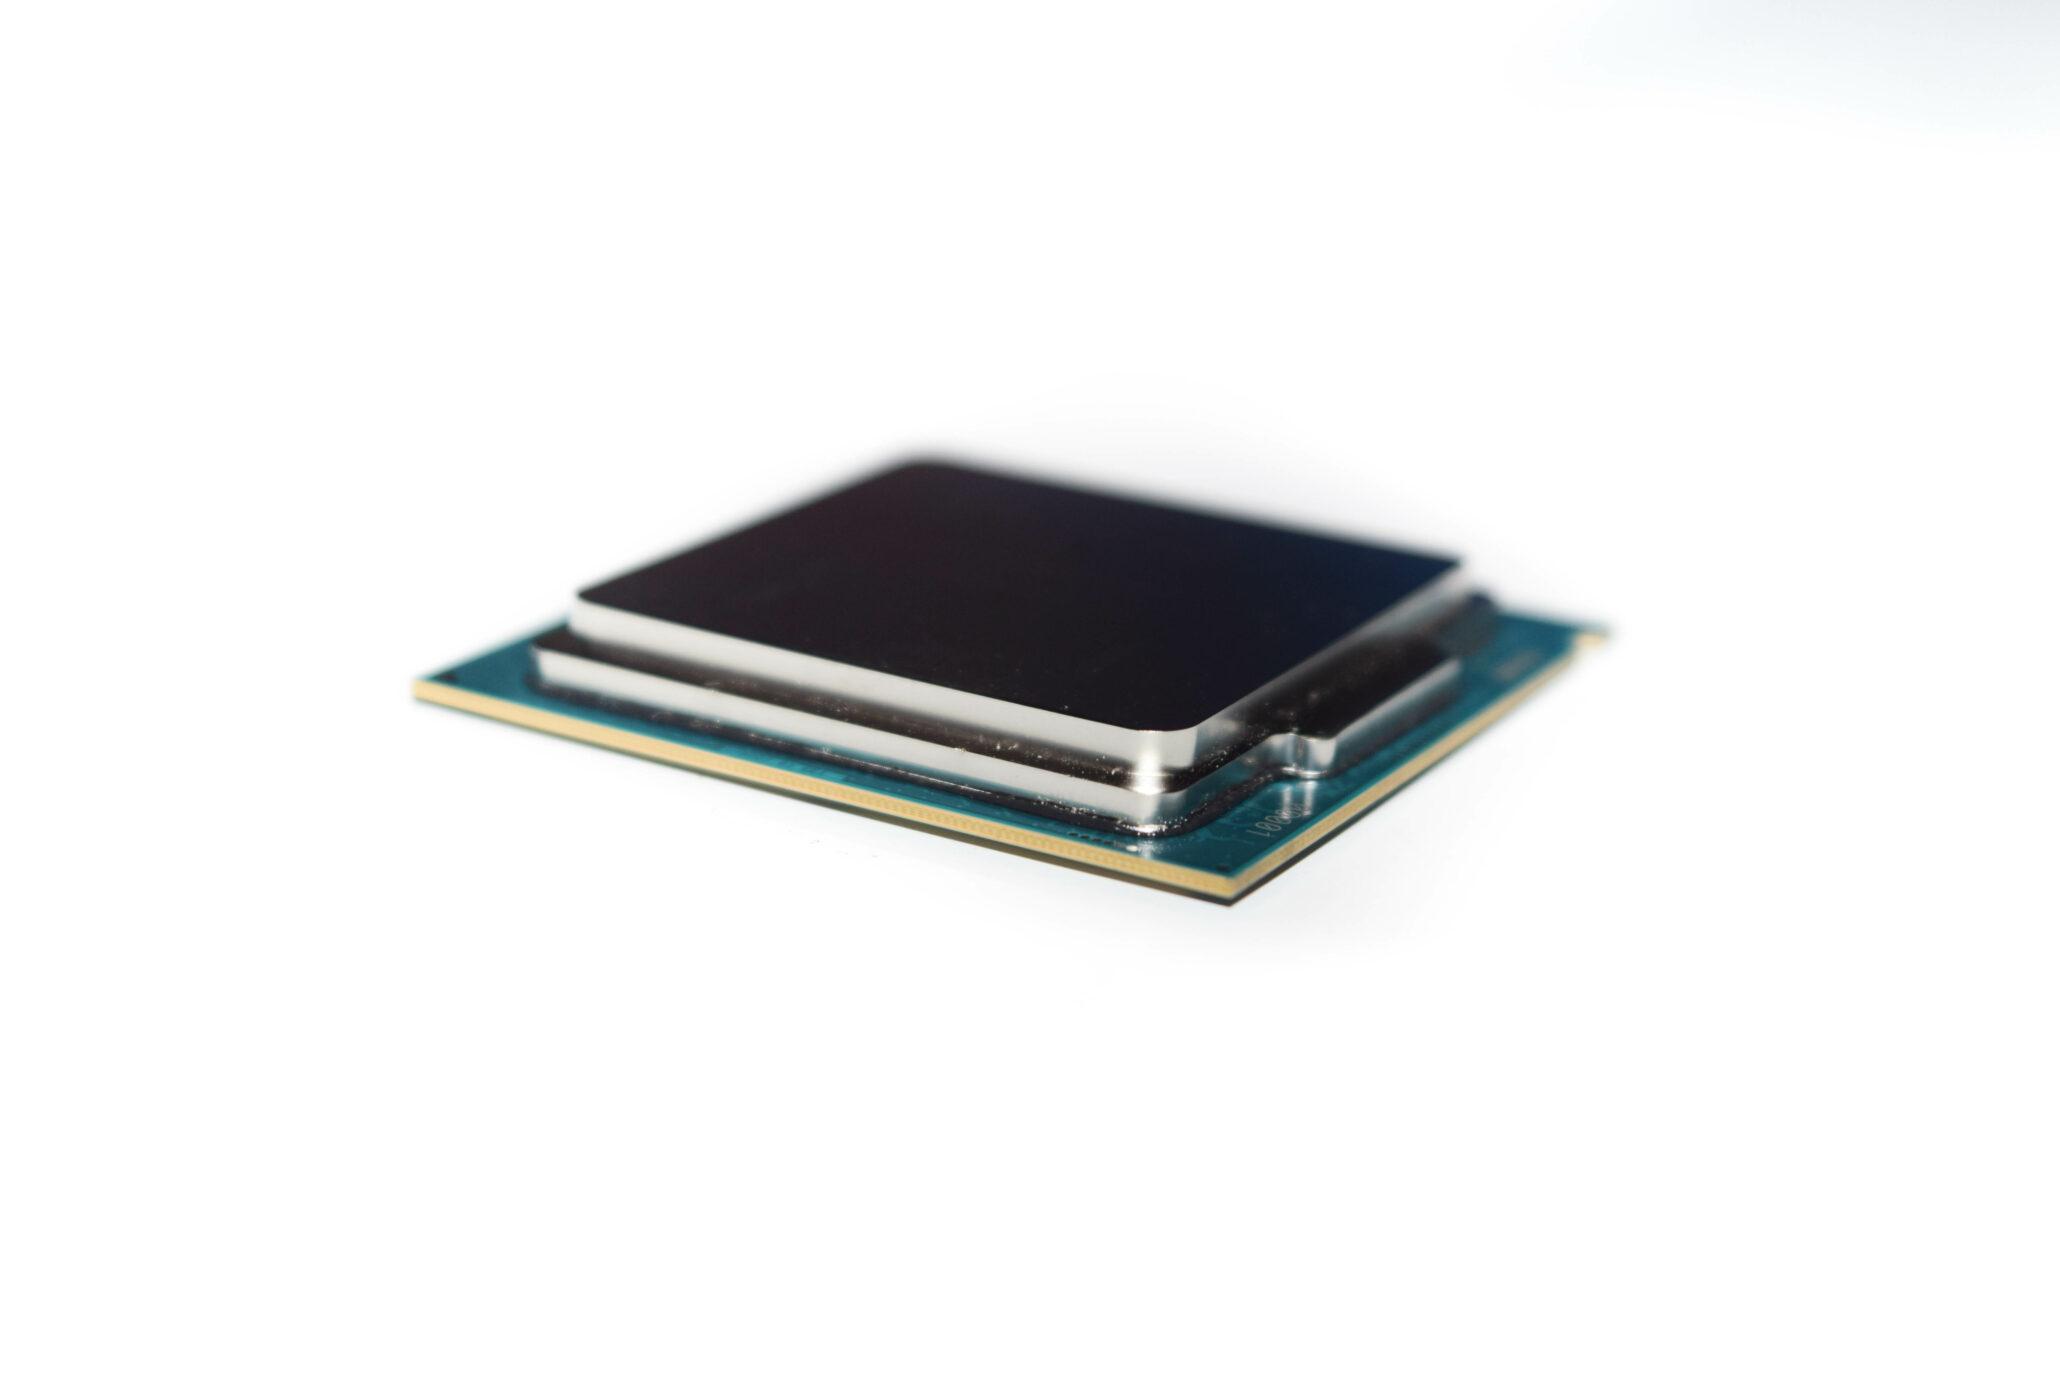 intel-core-i7-6700k-processor_6